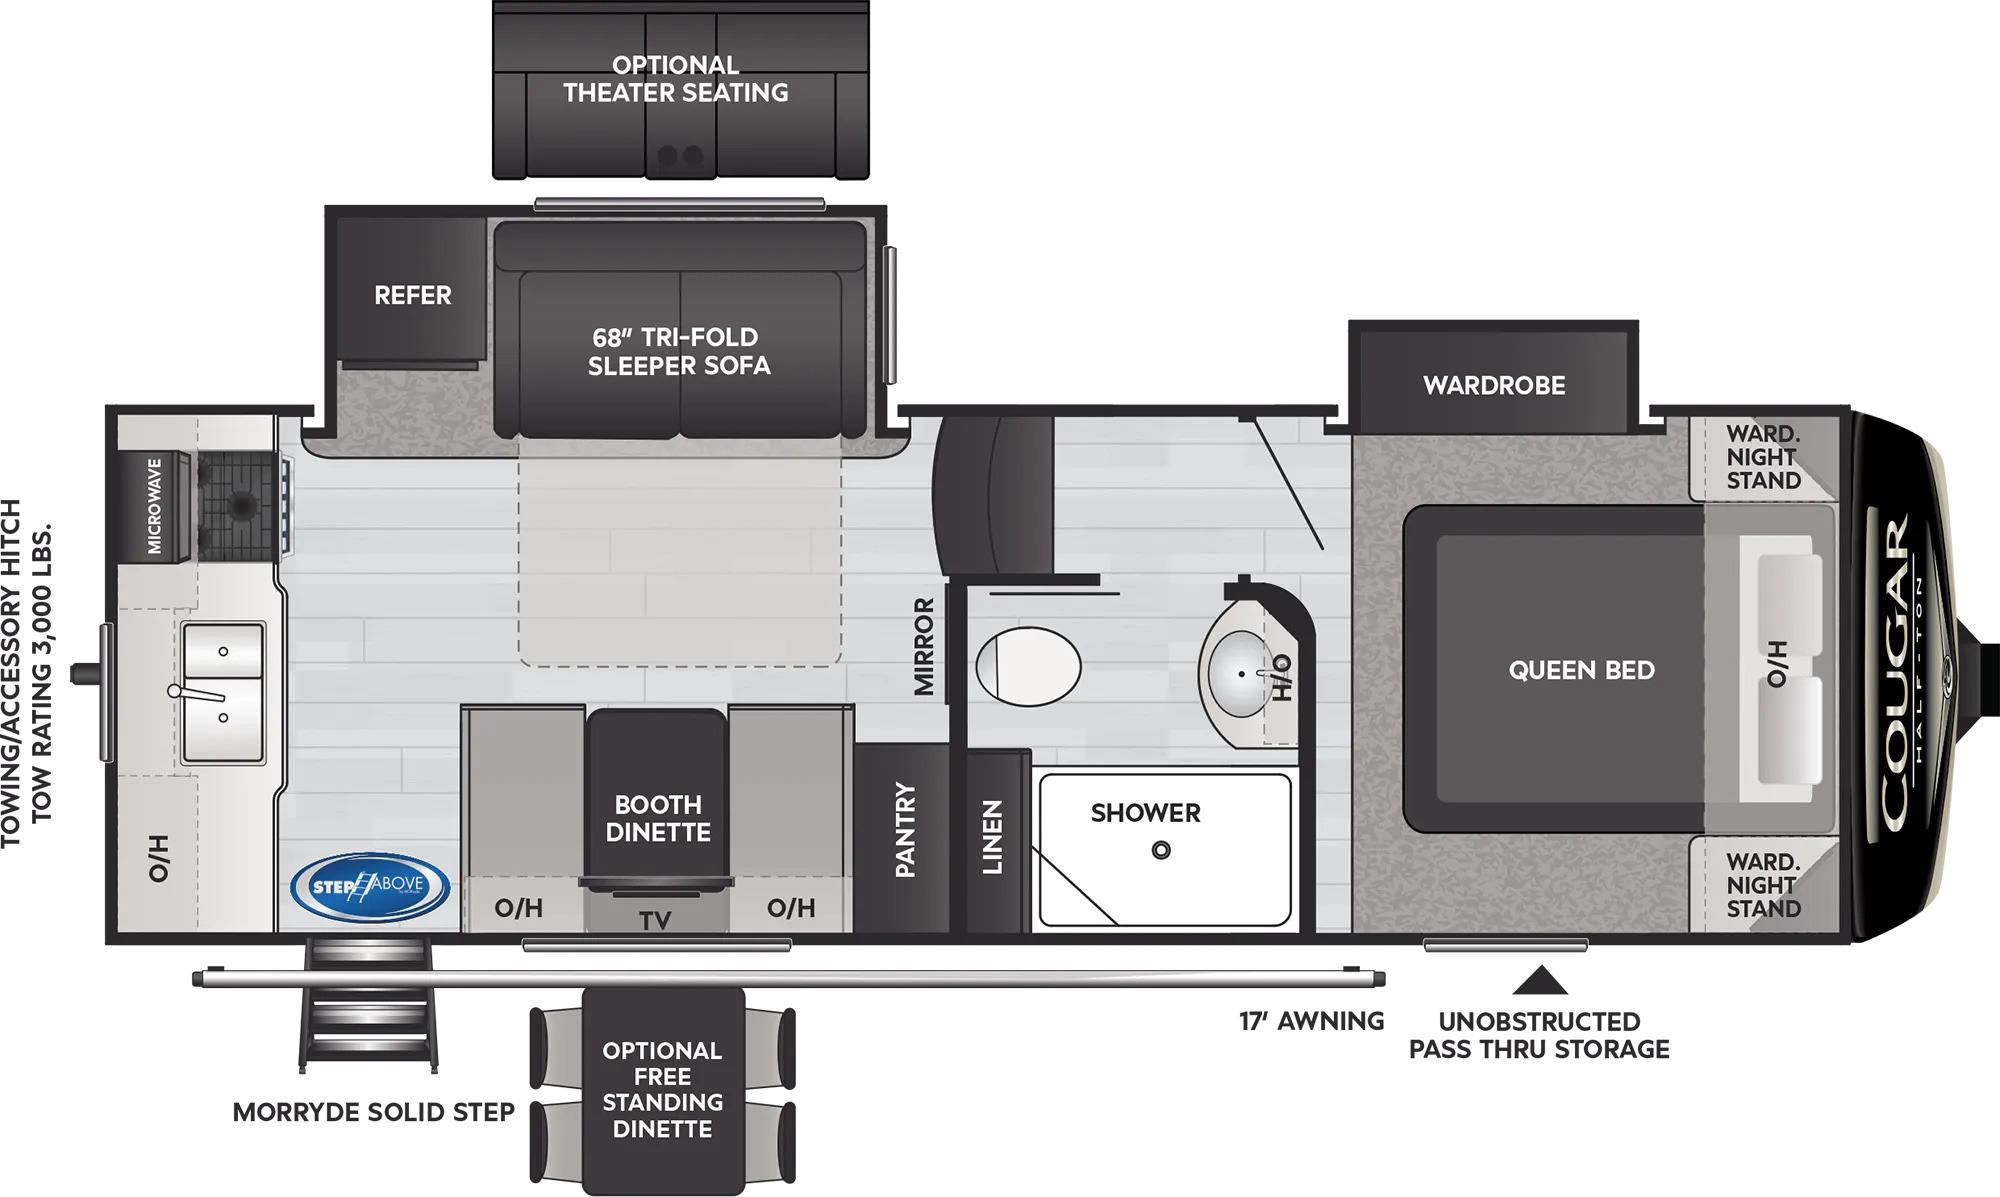 View Floor Plan for 2022 KEYSTONE COUGAR 23MLS